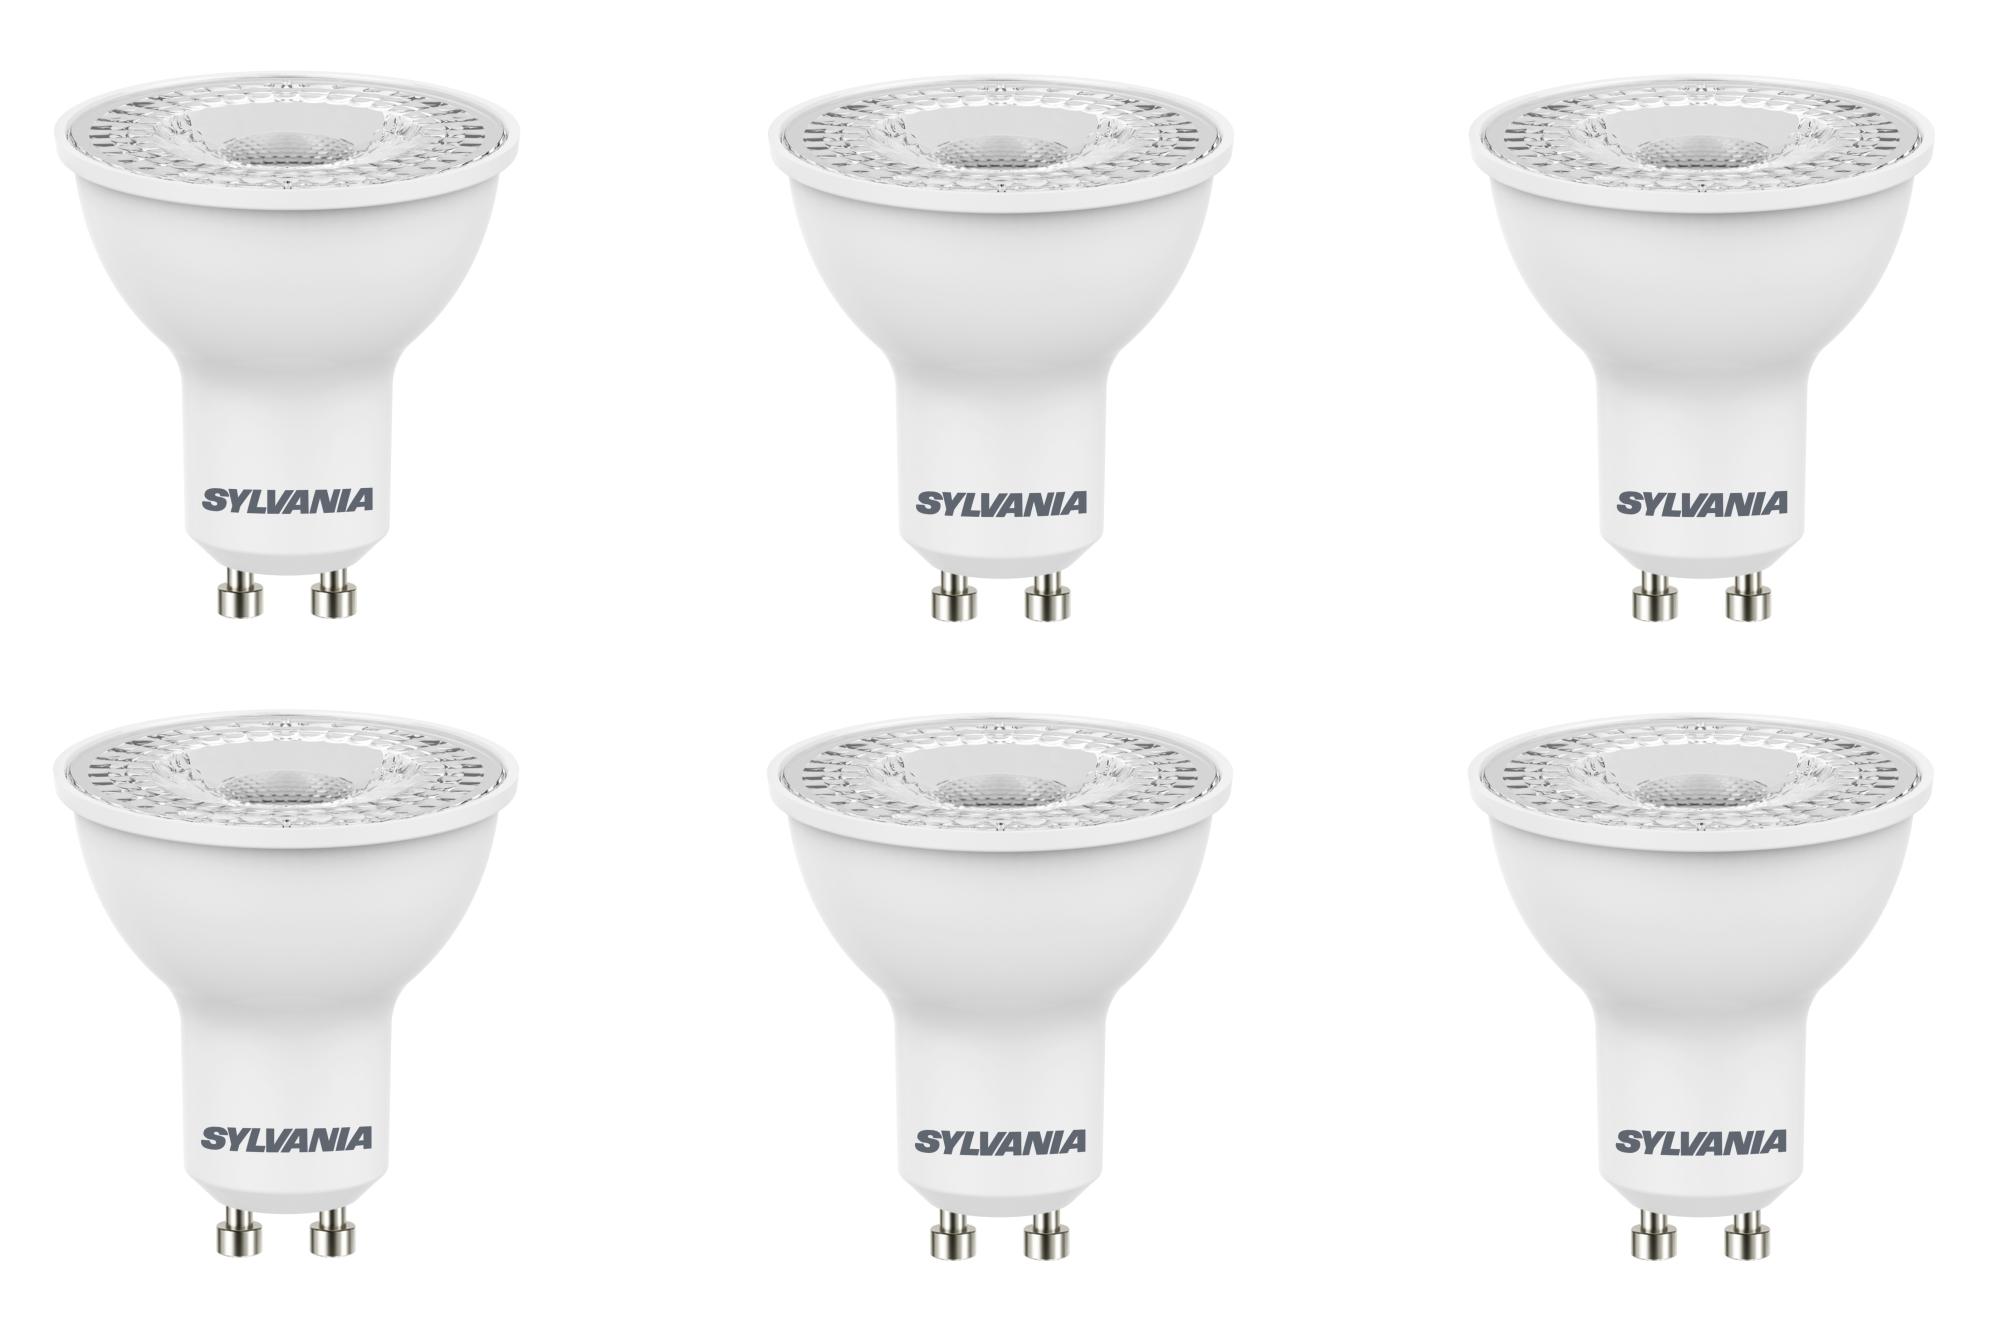 6x Sylvania Refled Es50 V4 5w Gu10 Led Dimmable Light Bulb Lamp 840 Cool White 5410288284422 Ebay